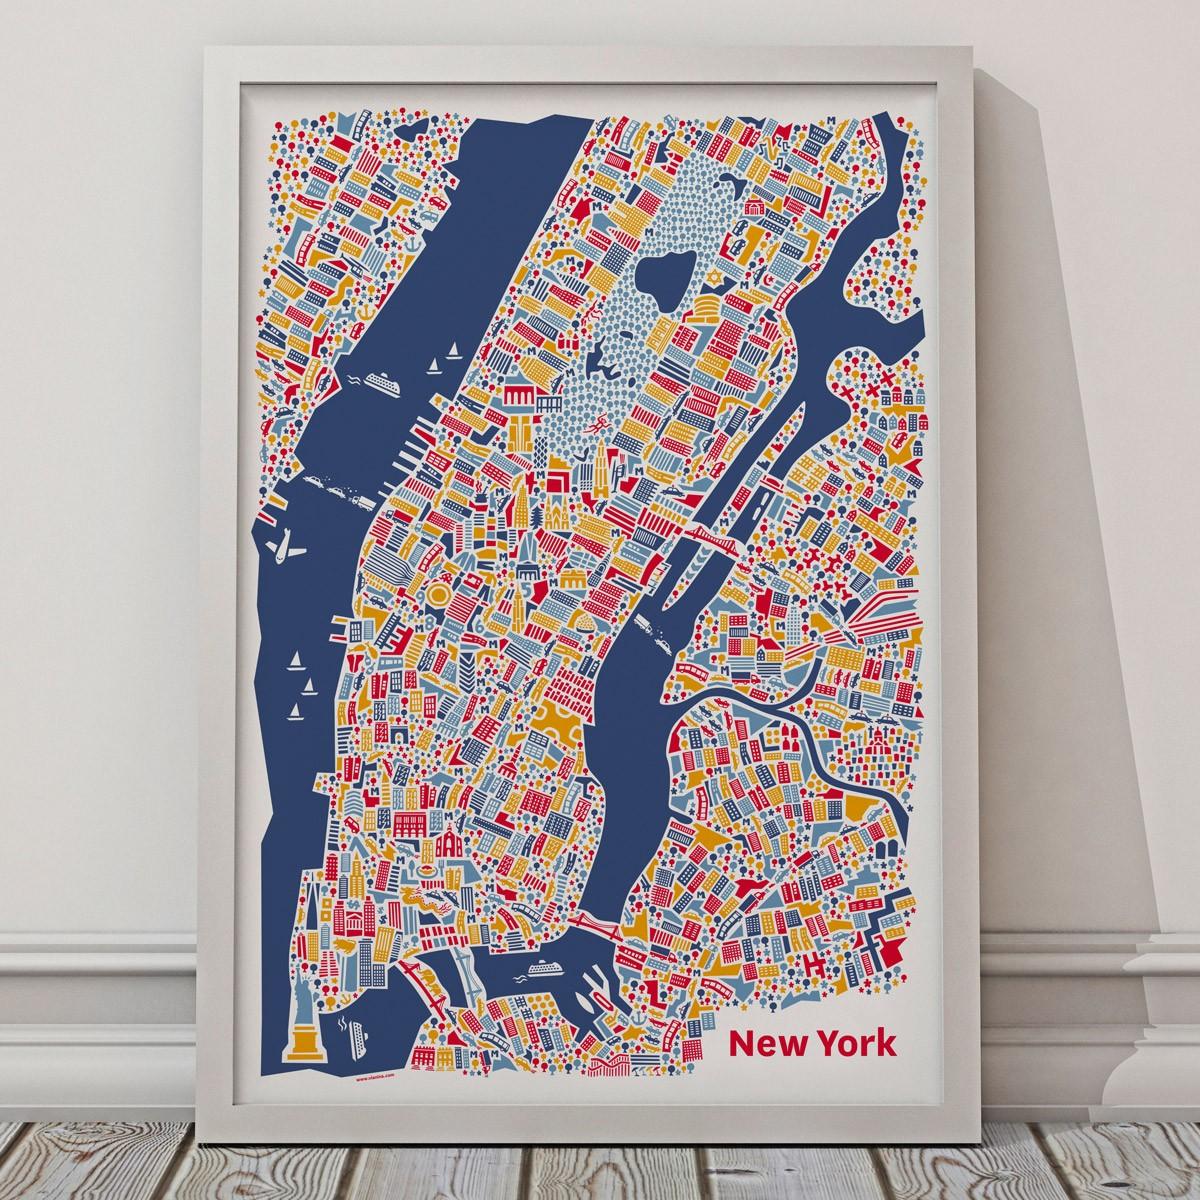 vianina new york poster 50 x 70. Black Bedroom Furniture Sets. Home Design Ideas